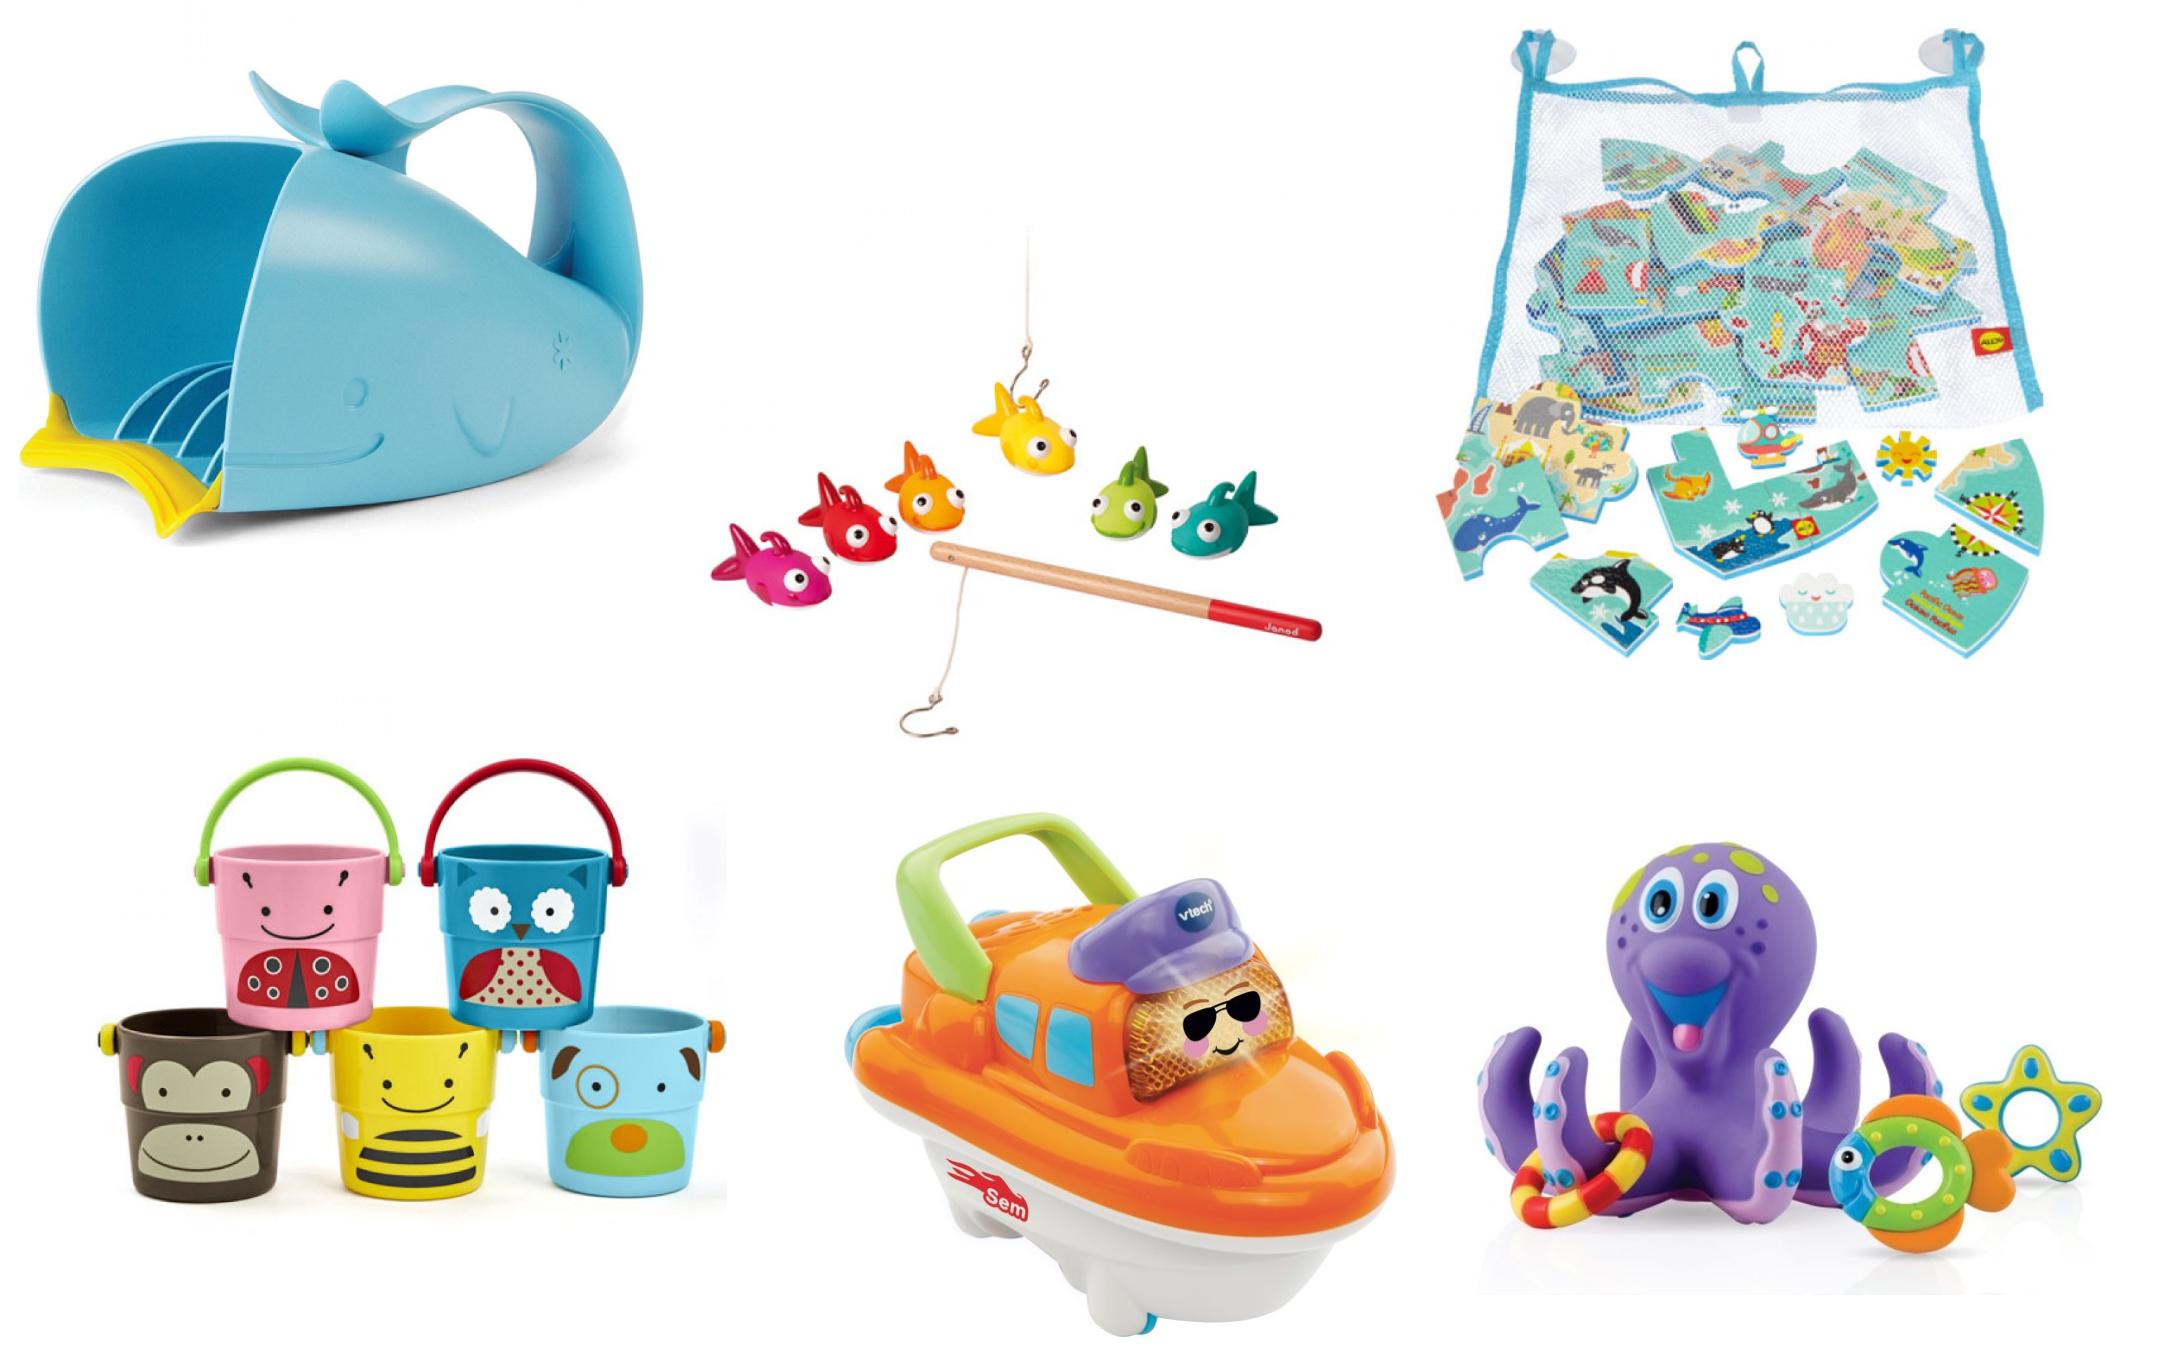 Badspeelgoed Elisejoanne.nl - Leuk baby- en kinderspeelgoed voor in bad/douche!